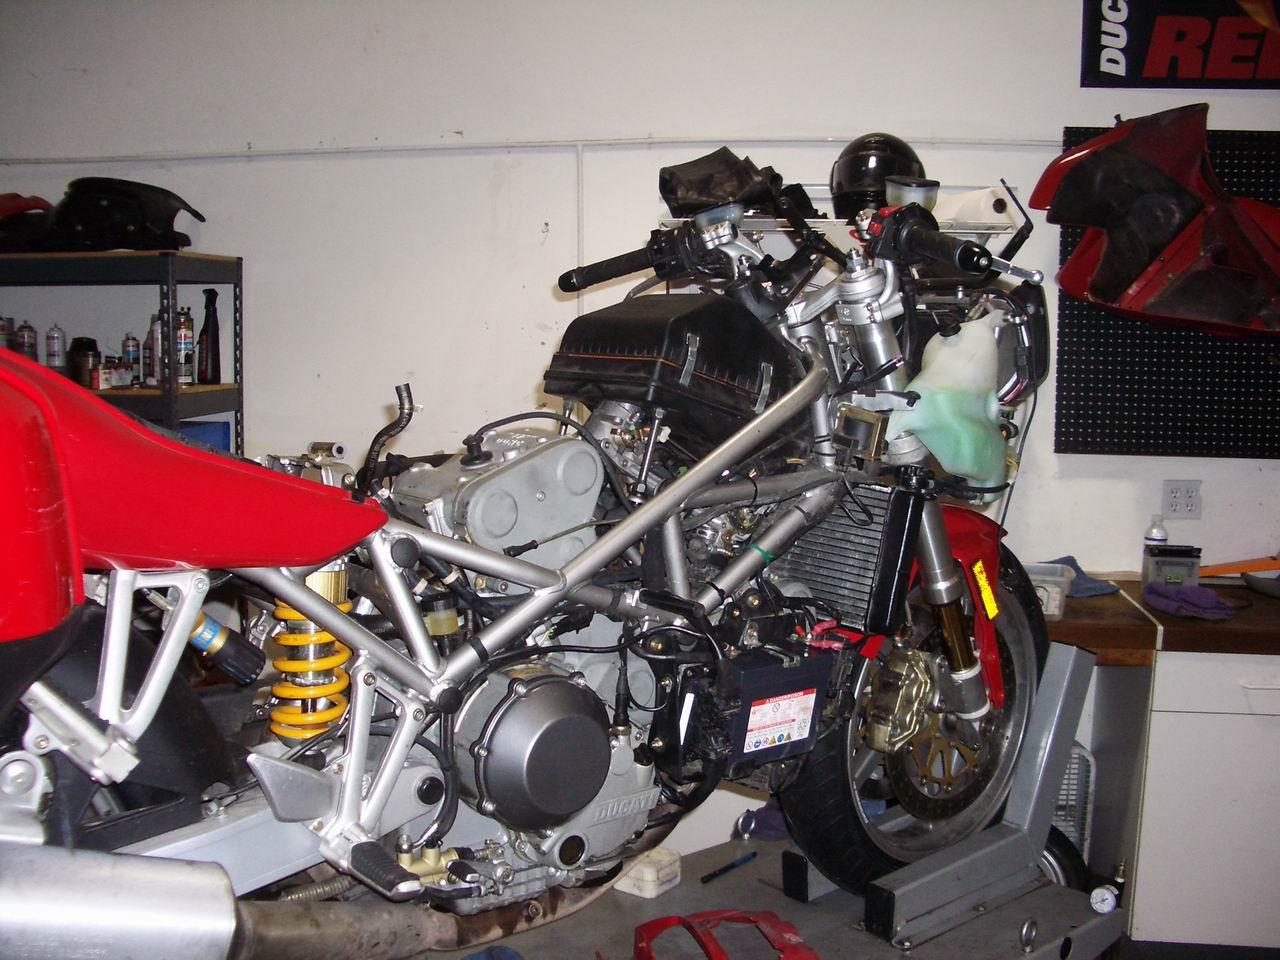 ducati st4 wiring wire center u2022 rh 207 246 123 107 Ducati Multistrada Ducati Diavel AMG Special Edition